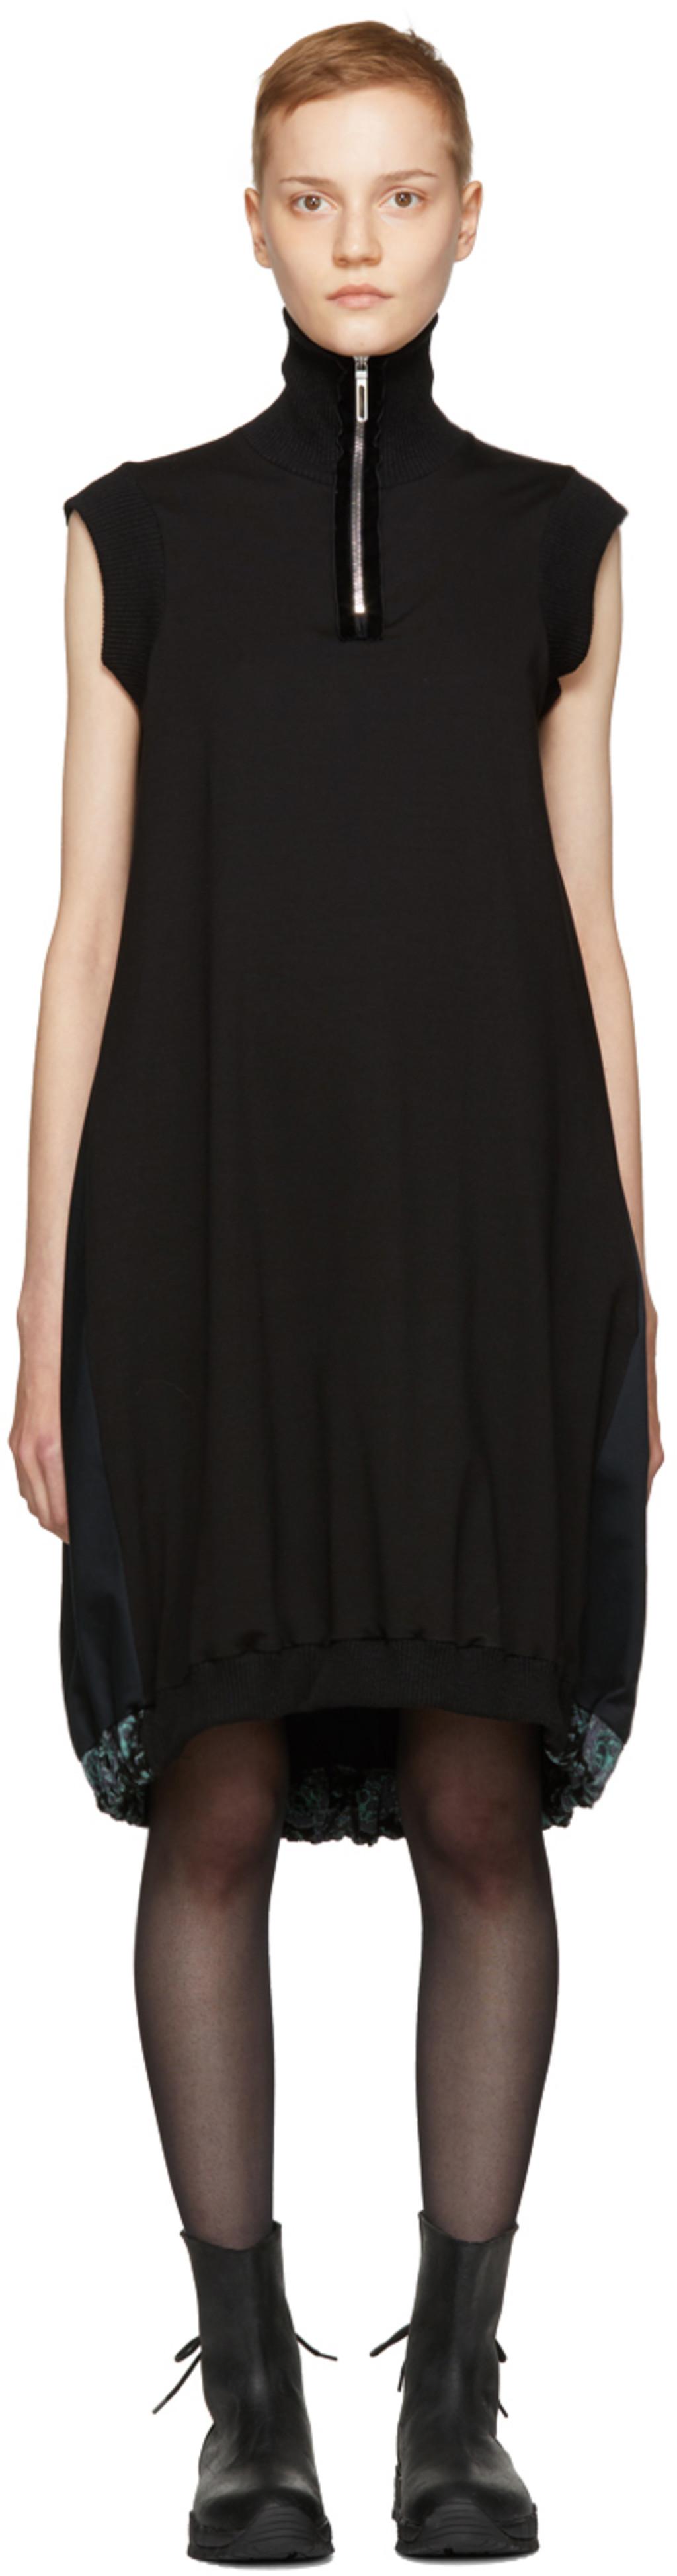 Black Forma Dress Ovelia Transtoto uiRxDM